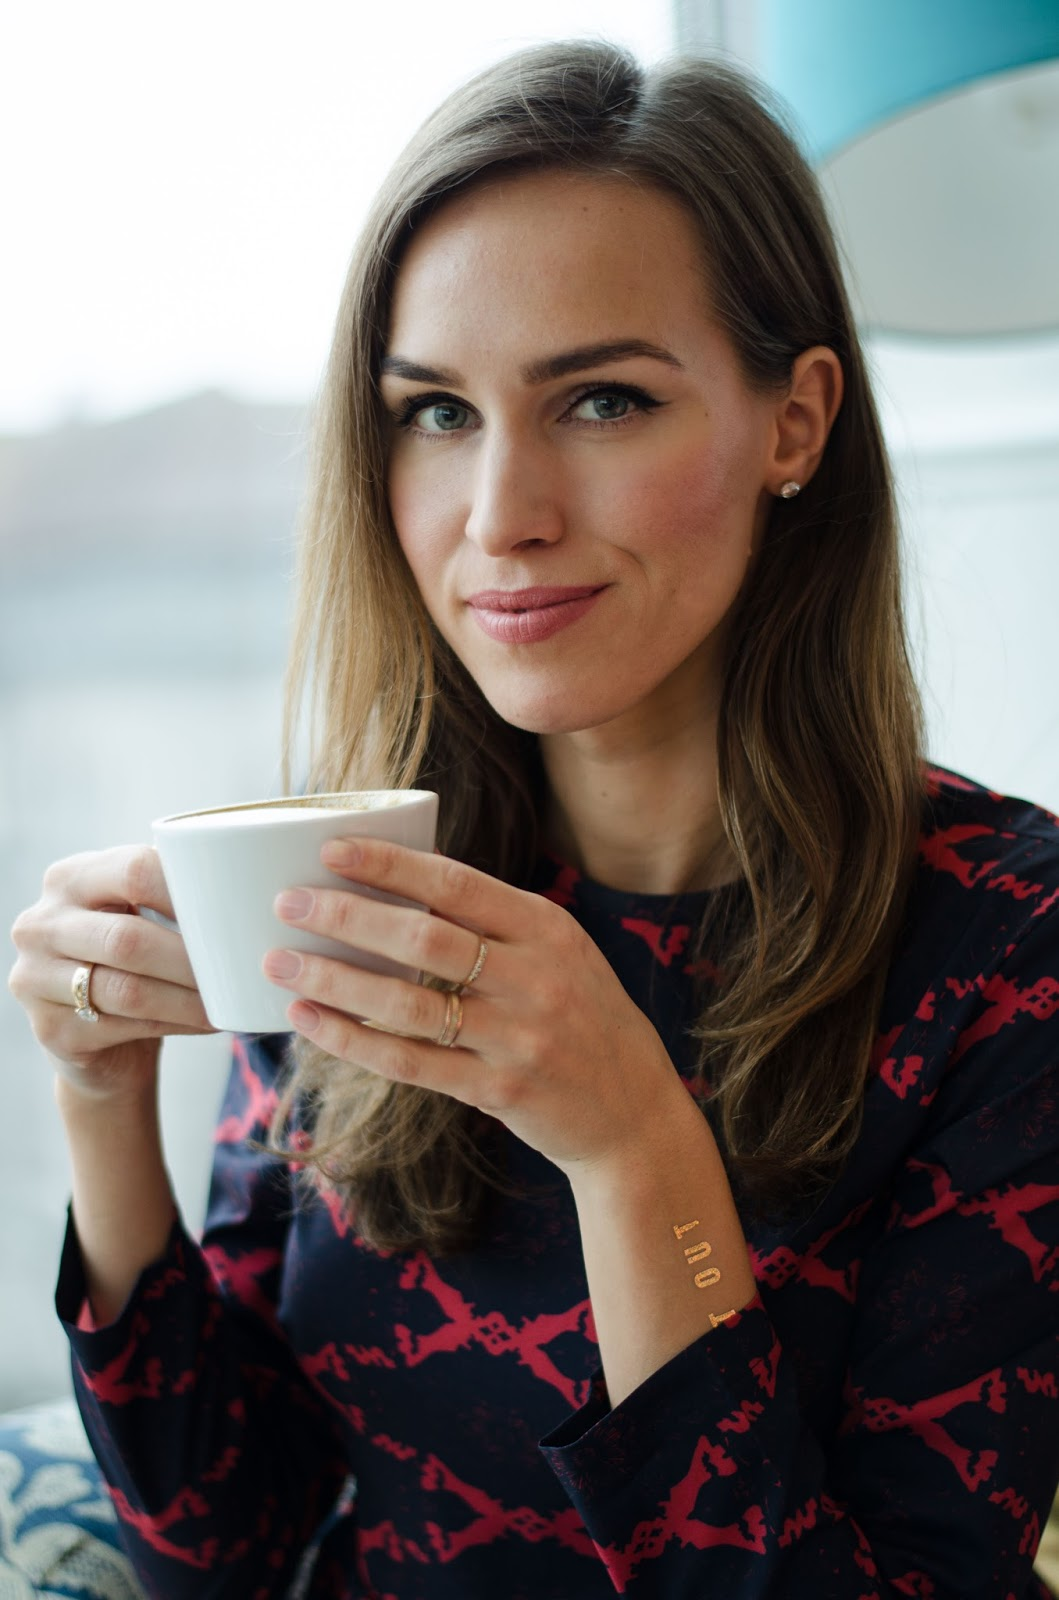 kristjaana mere coffee drinking in cafe